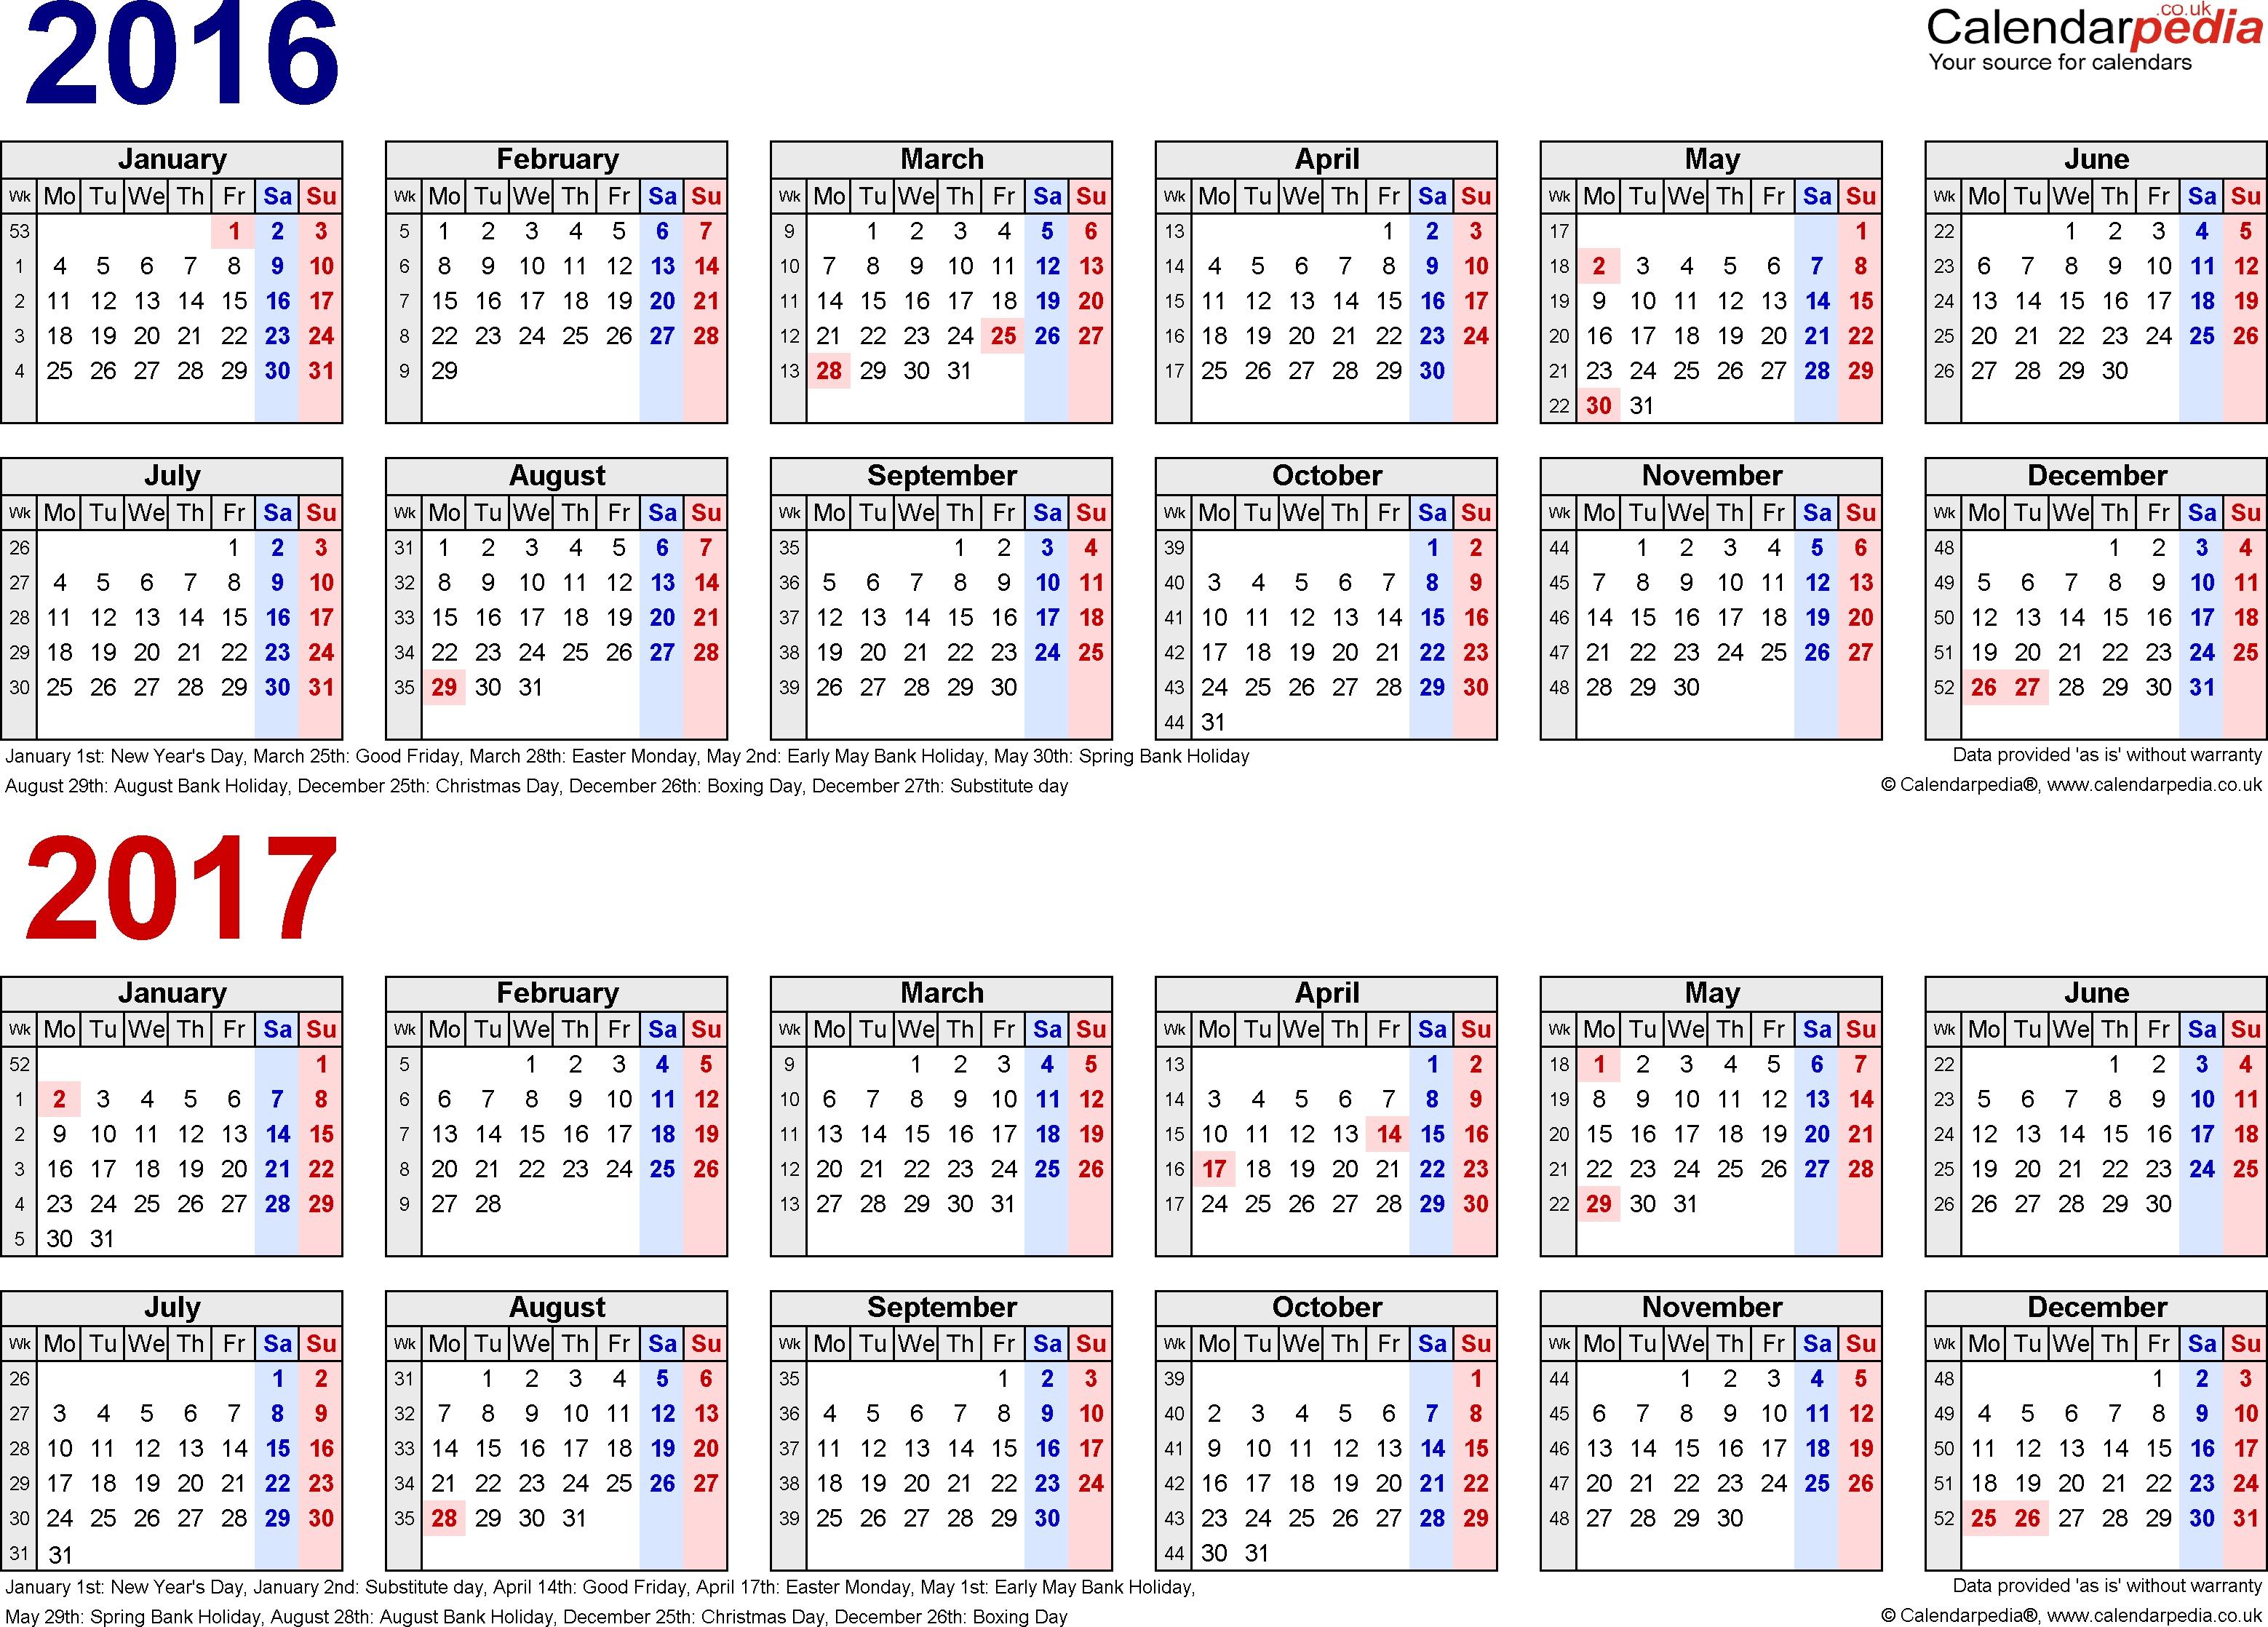 Chinese Lunar Calendar 2017 Yearly Calendar Printable  xjb